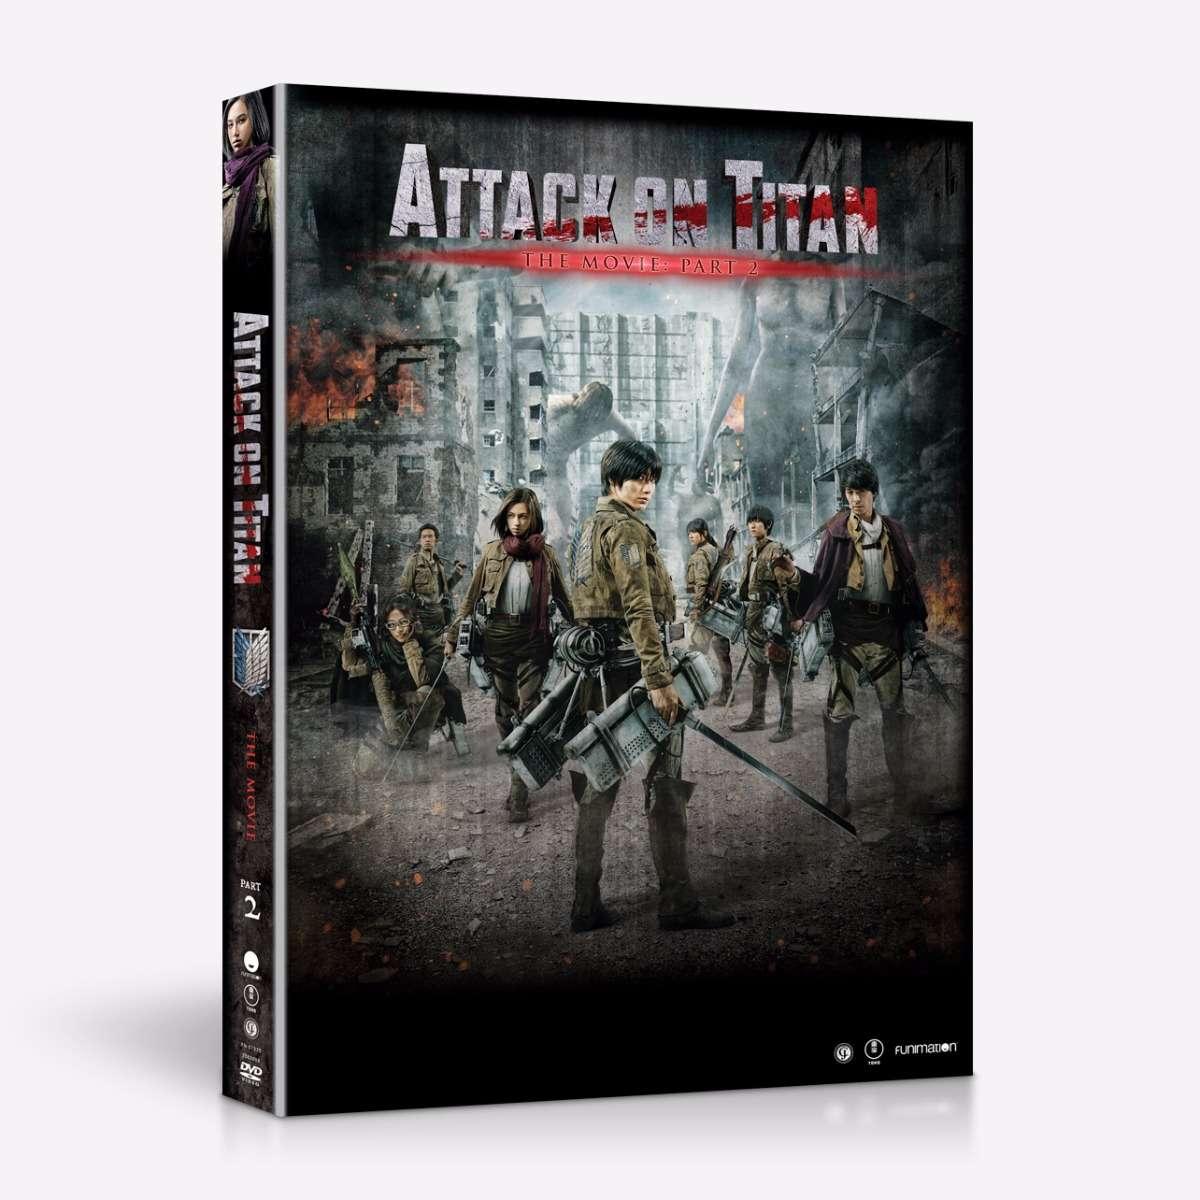 Attack On Titan - Live Action Movie - Part 2 - DVD